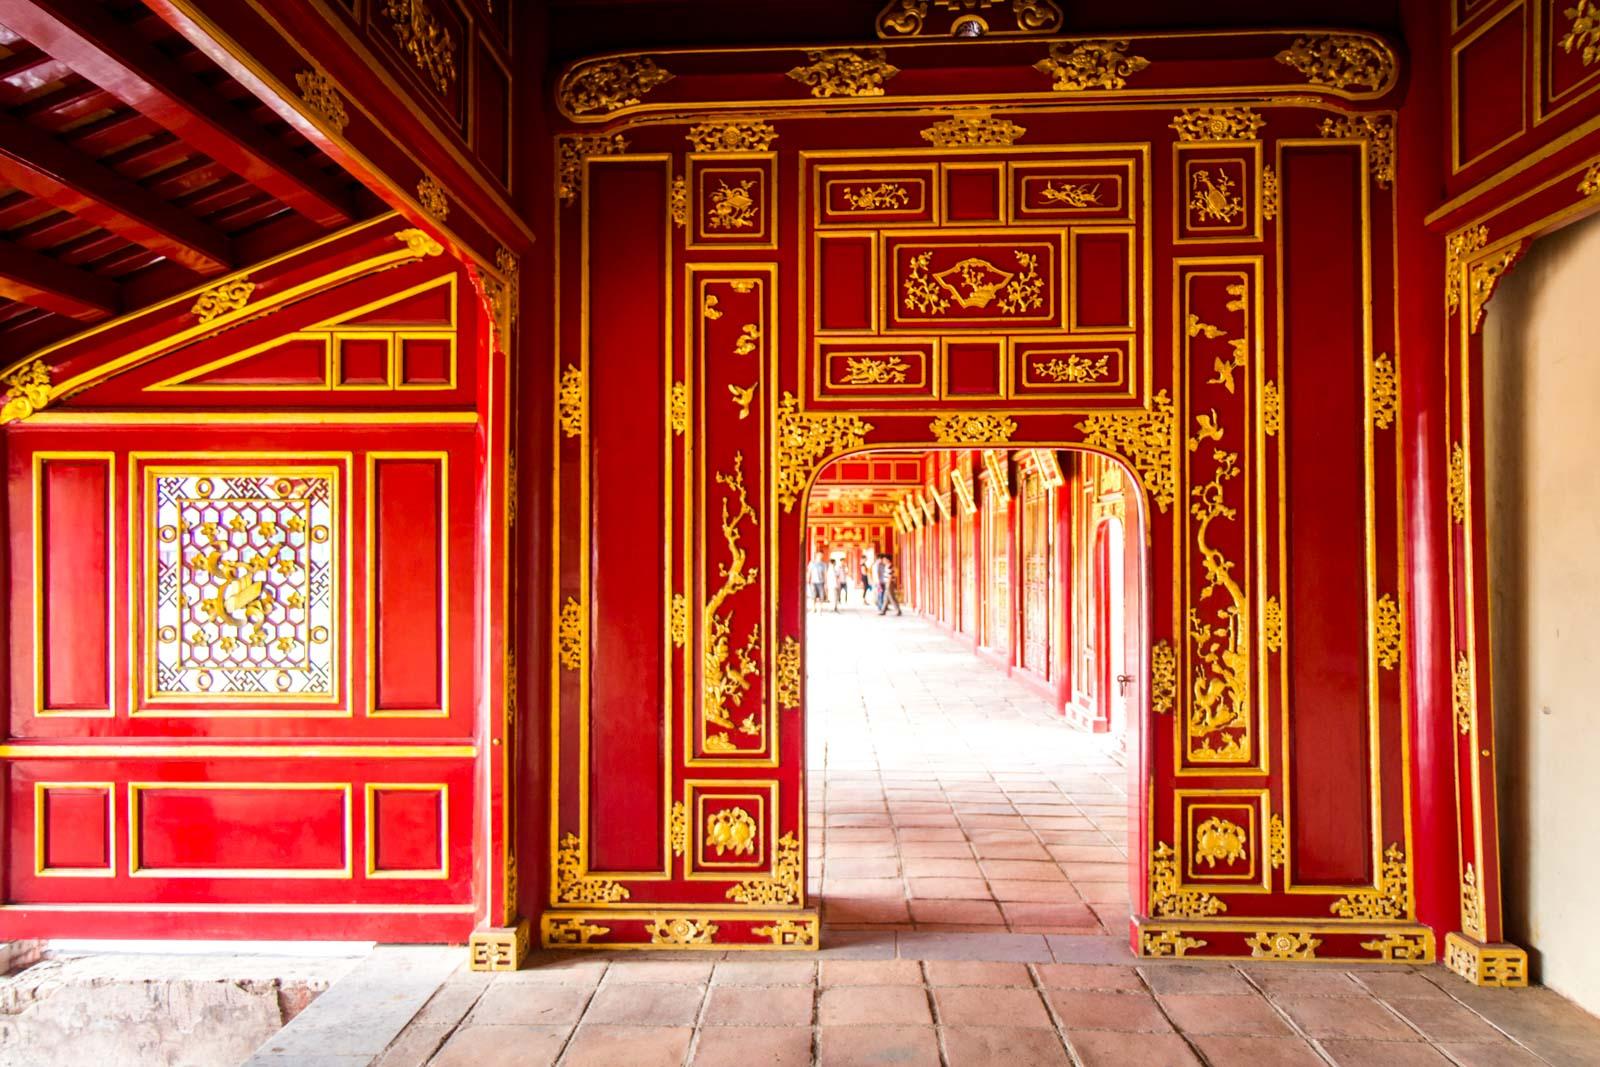 Imperial City of Hue, Vietnam